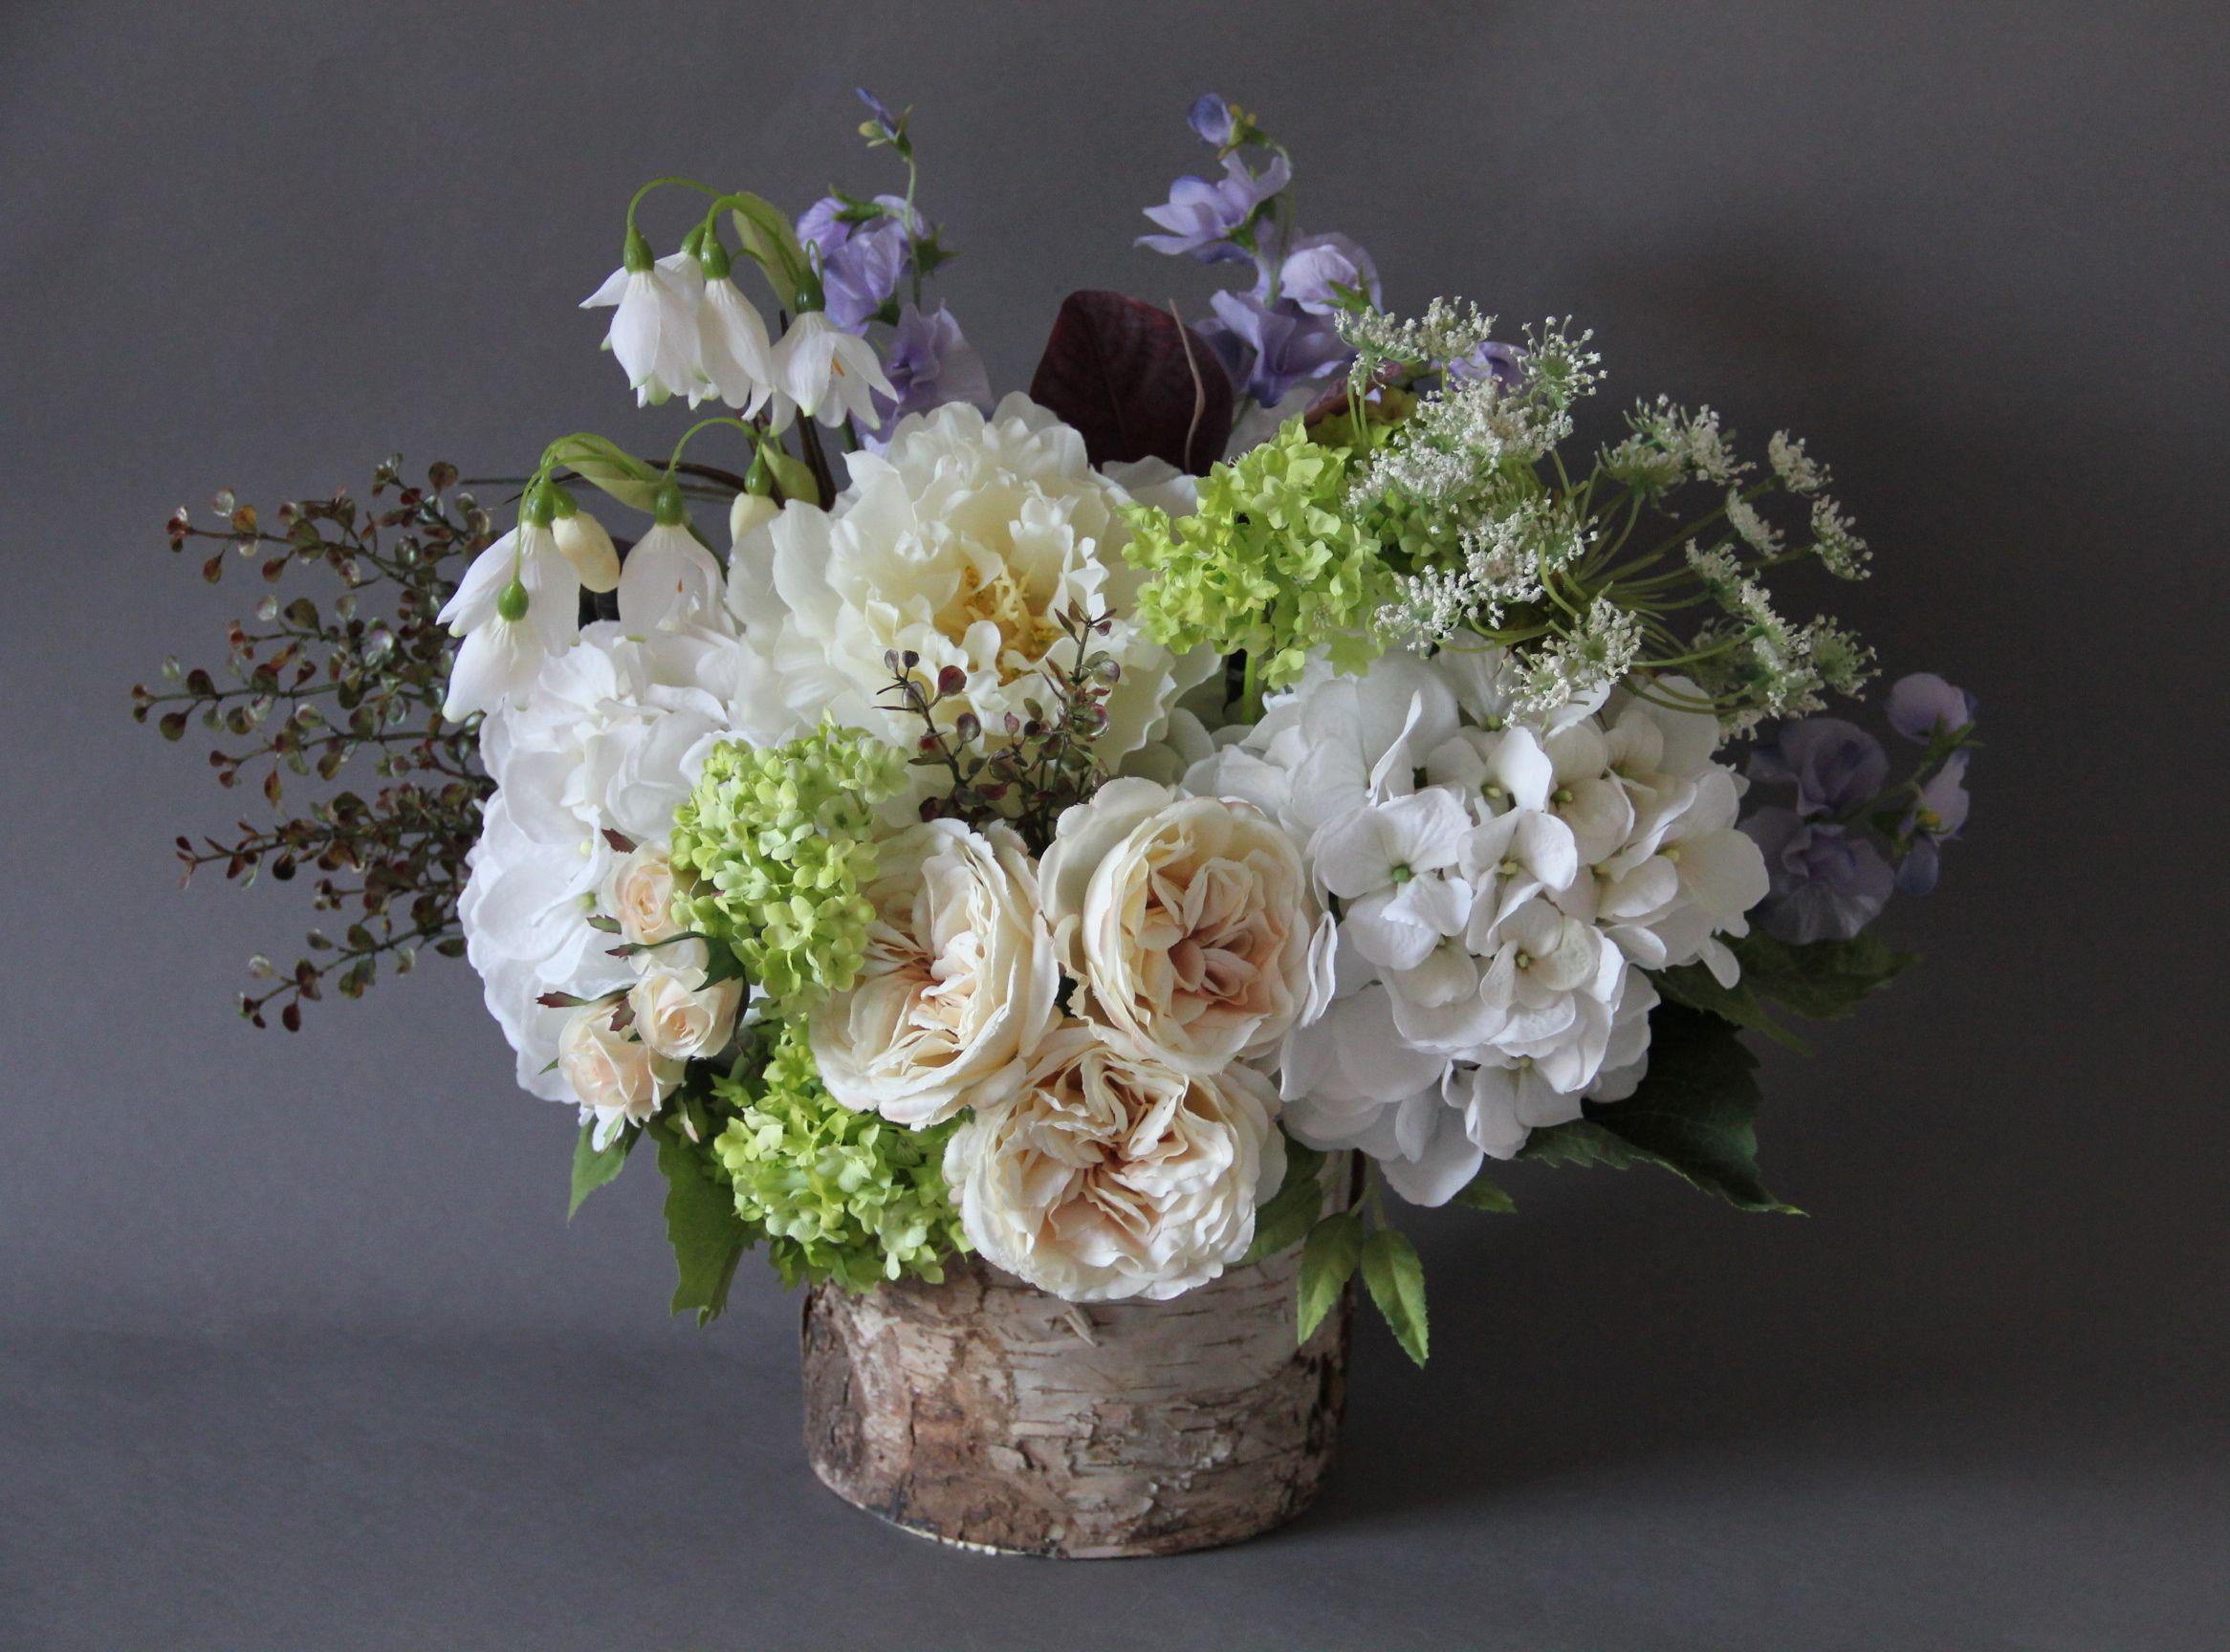 26 best silk flower arrangements and bouquets images on pinterest artificial silk flowers arrangement white hydrangeagarden roses viburnumsweet pea reviewsmspy